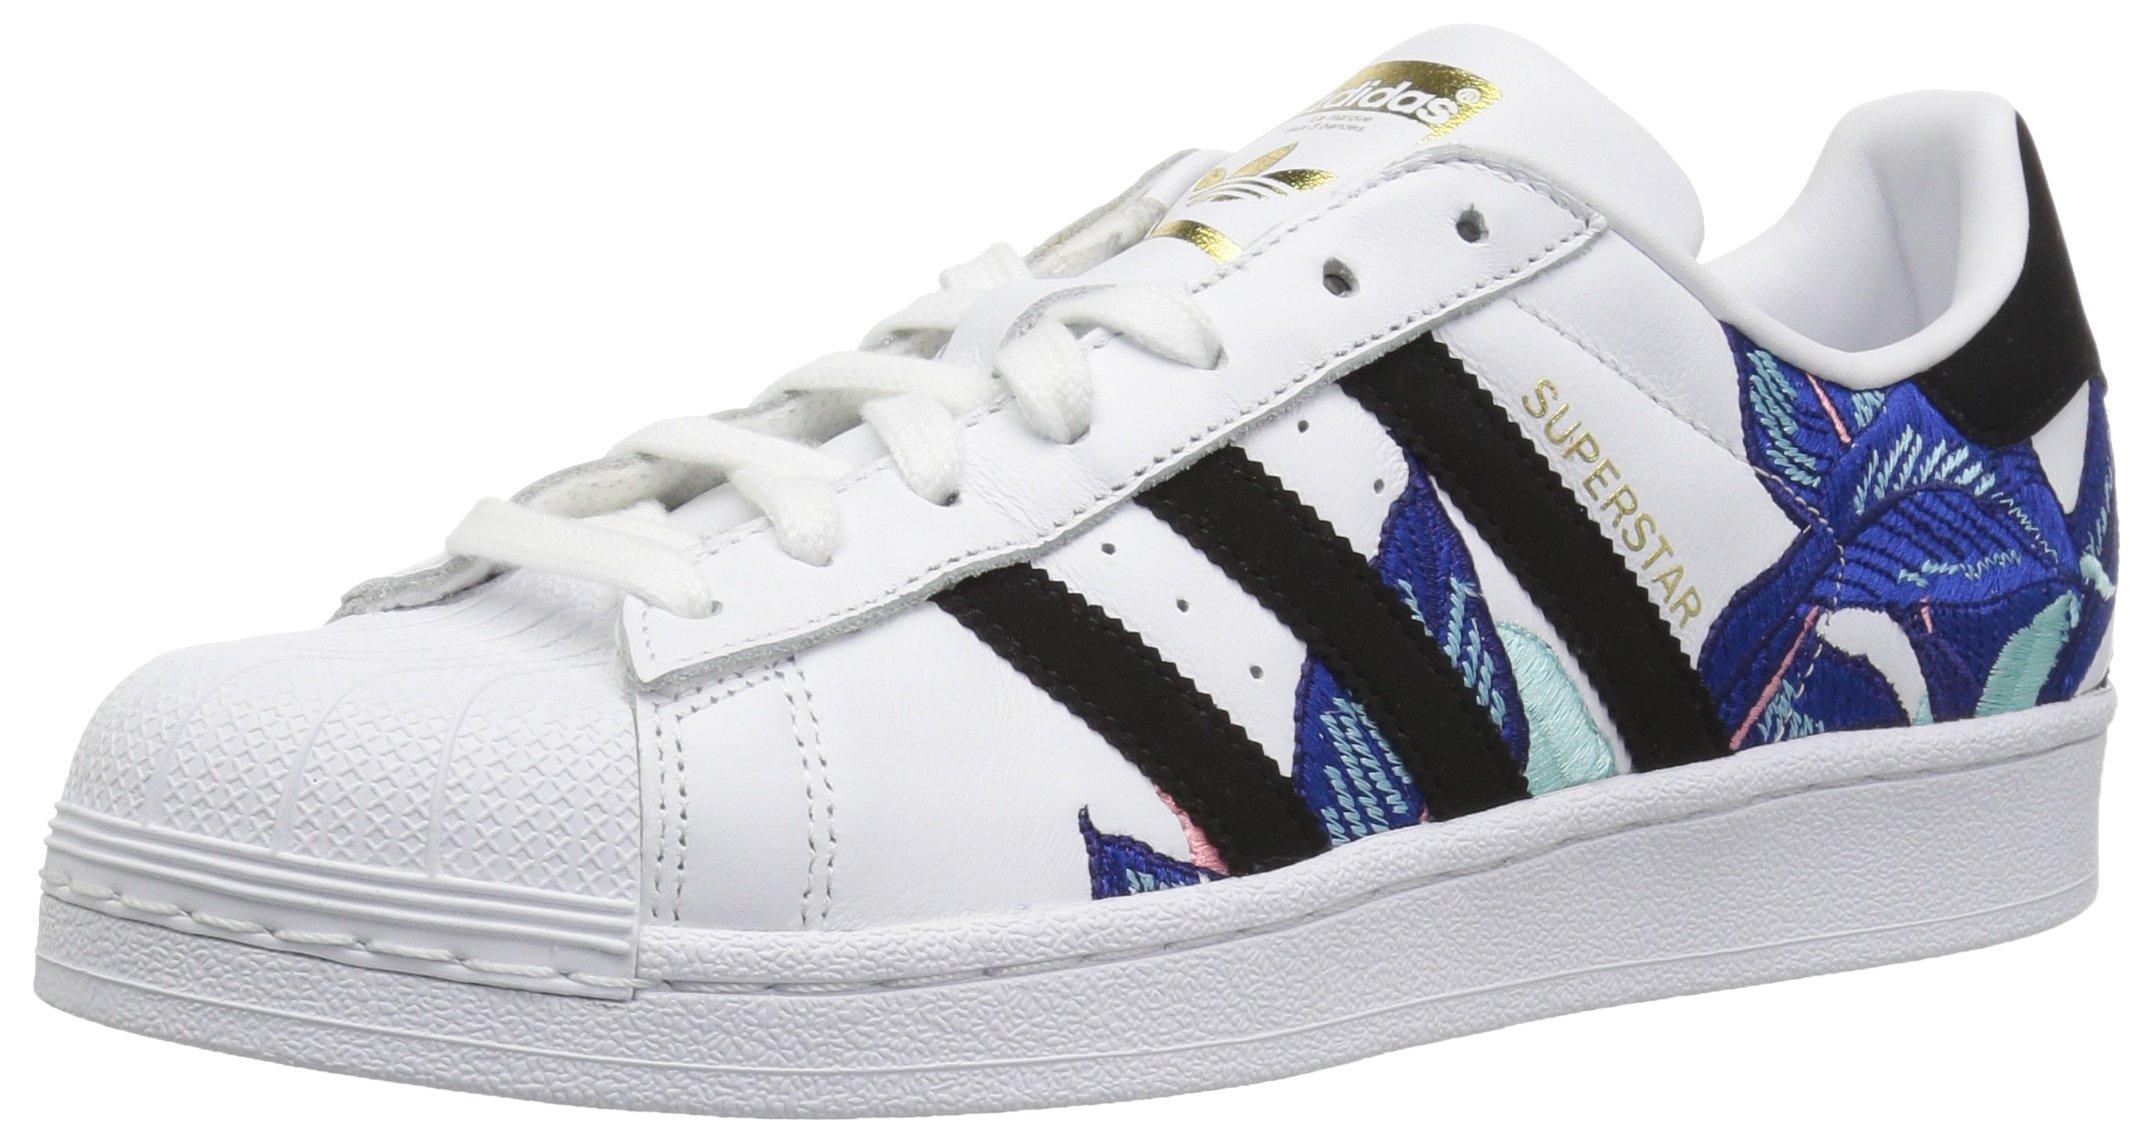 adidas Originals Women's Superstar Shoes Running, White/Black/Gold Metallic 8.5 M US